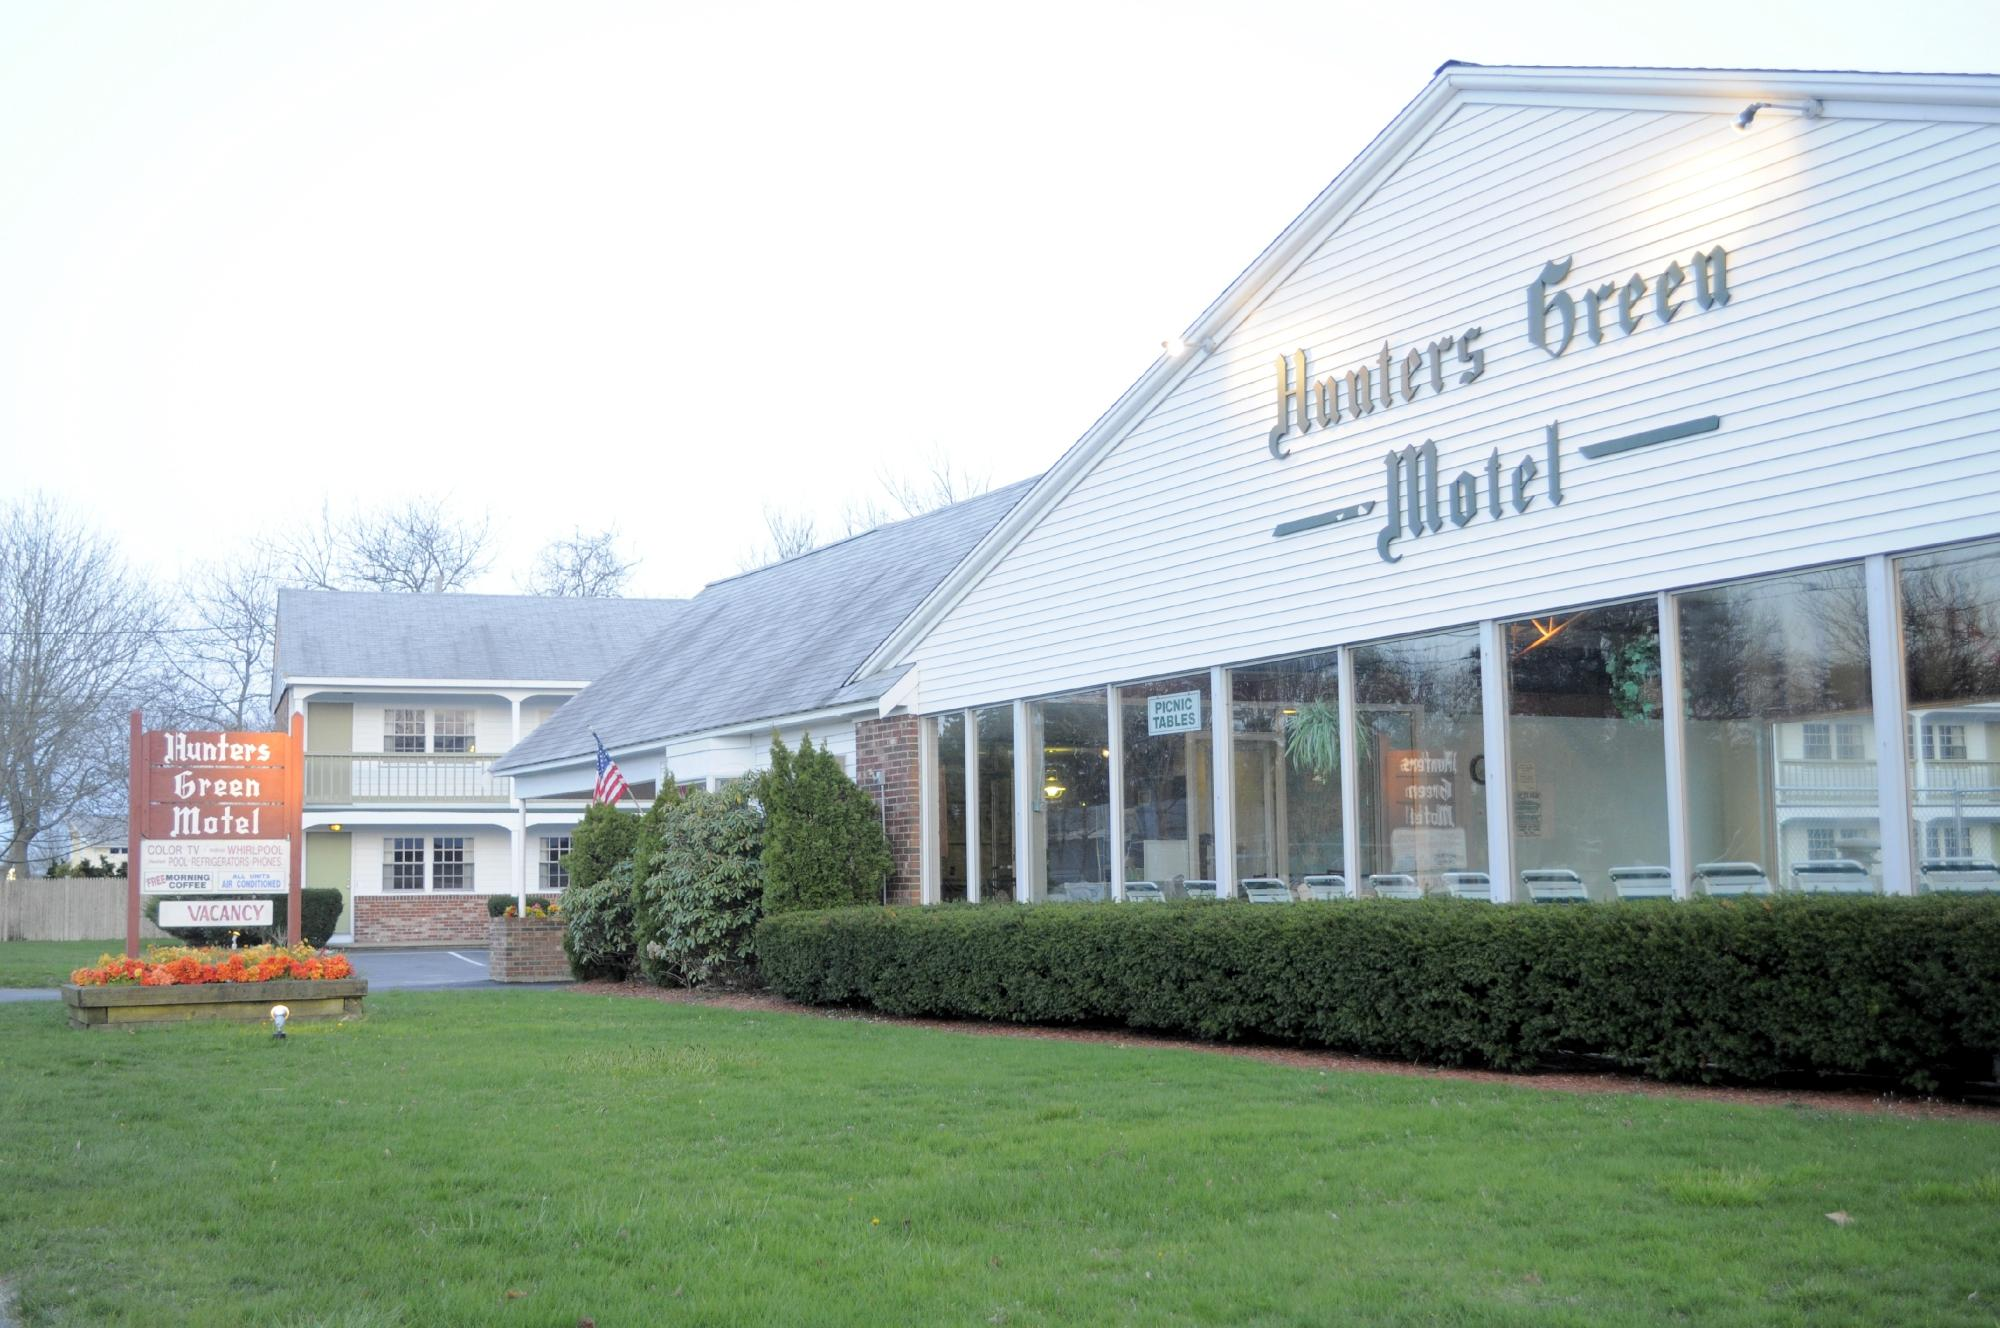 Hunters Green Motel